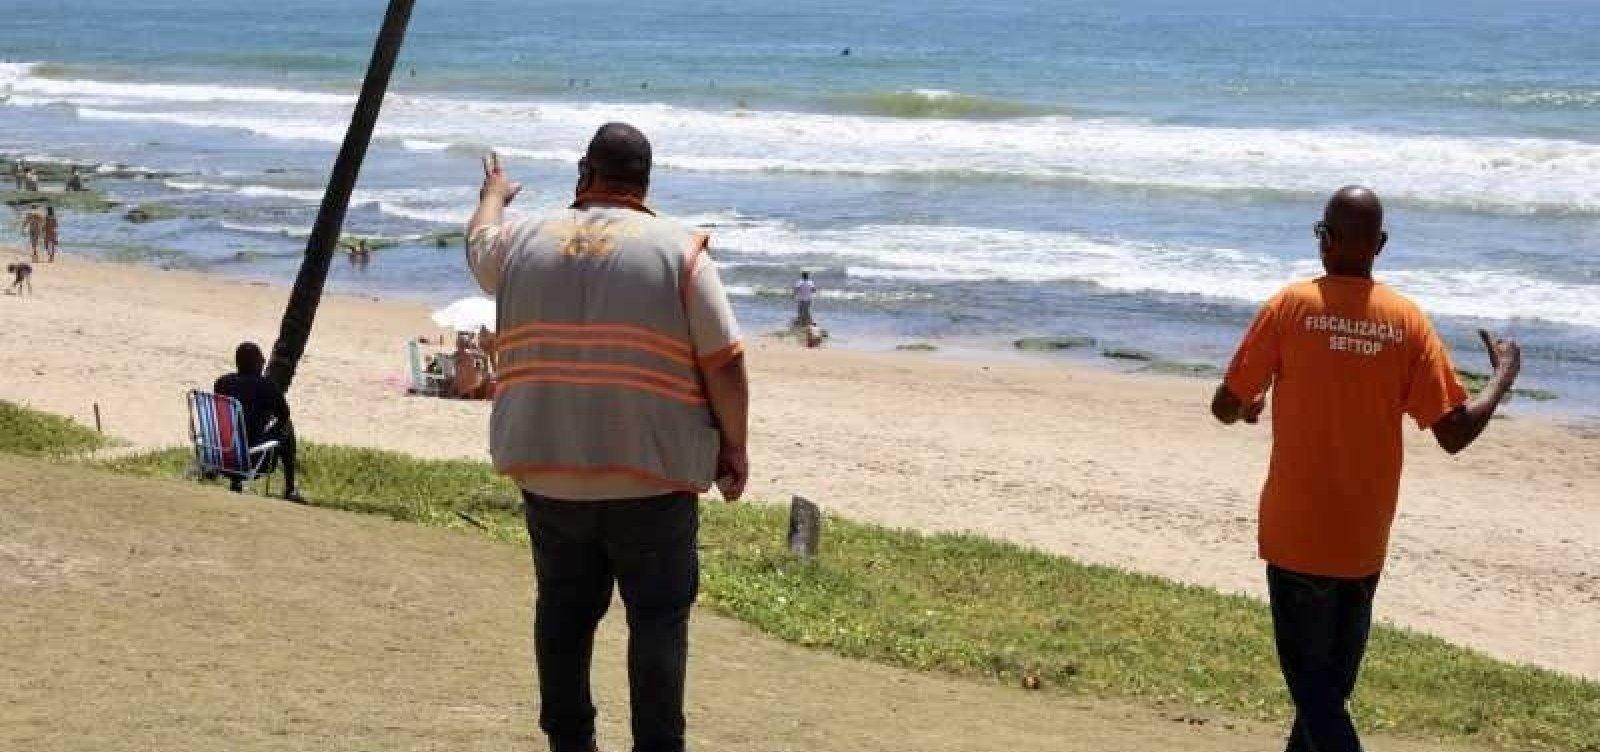 [Prefeitura de Lauro de Freitas prorroga decreto que proíbe comércio informal nas praias]